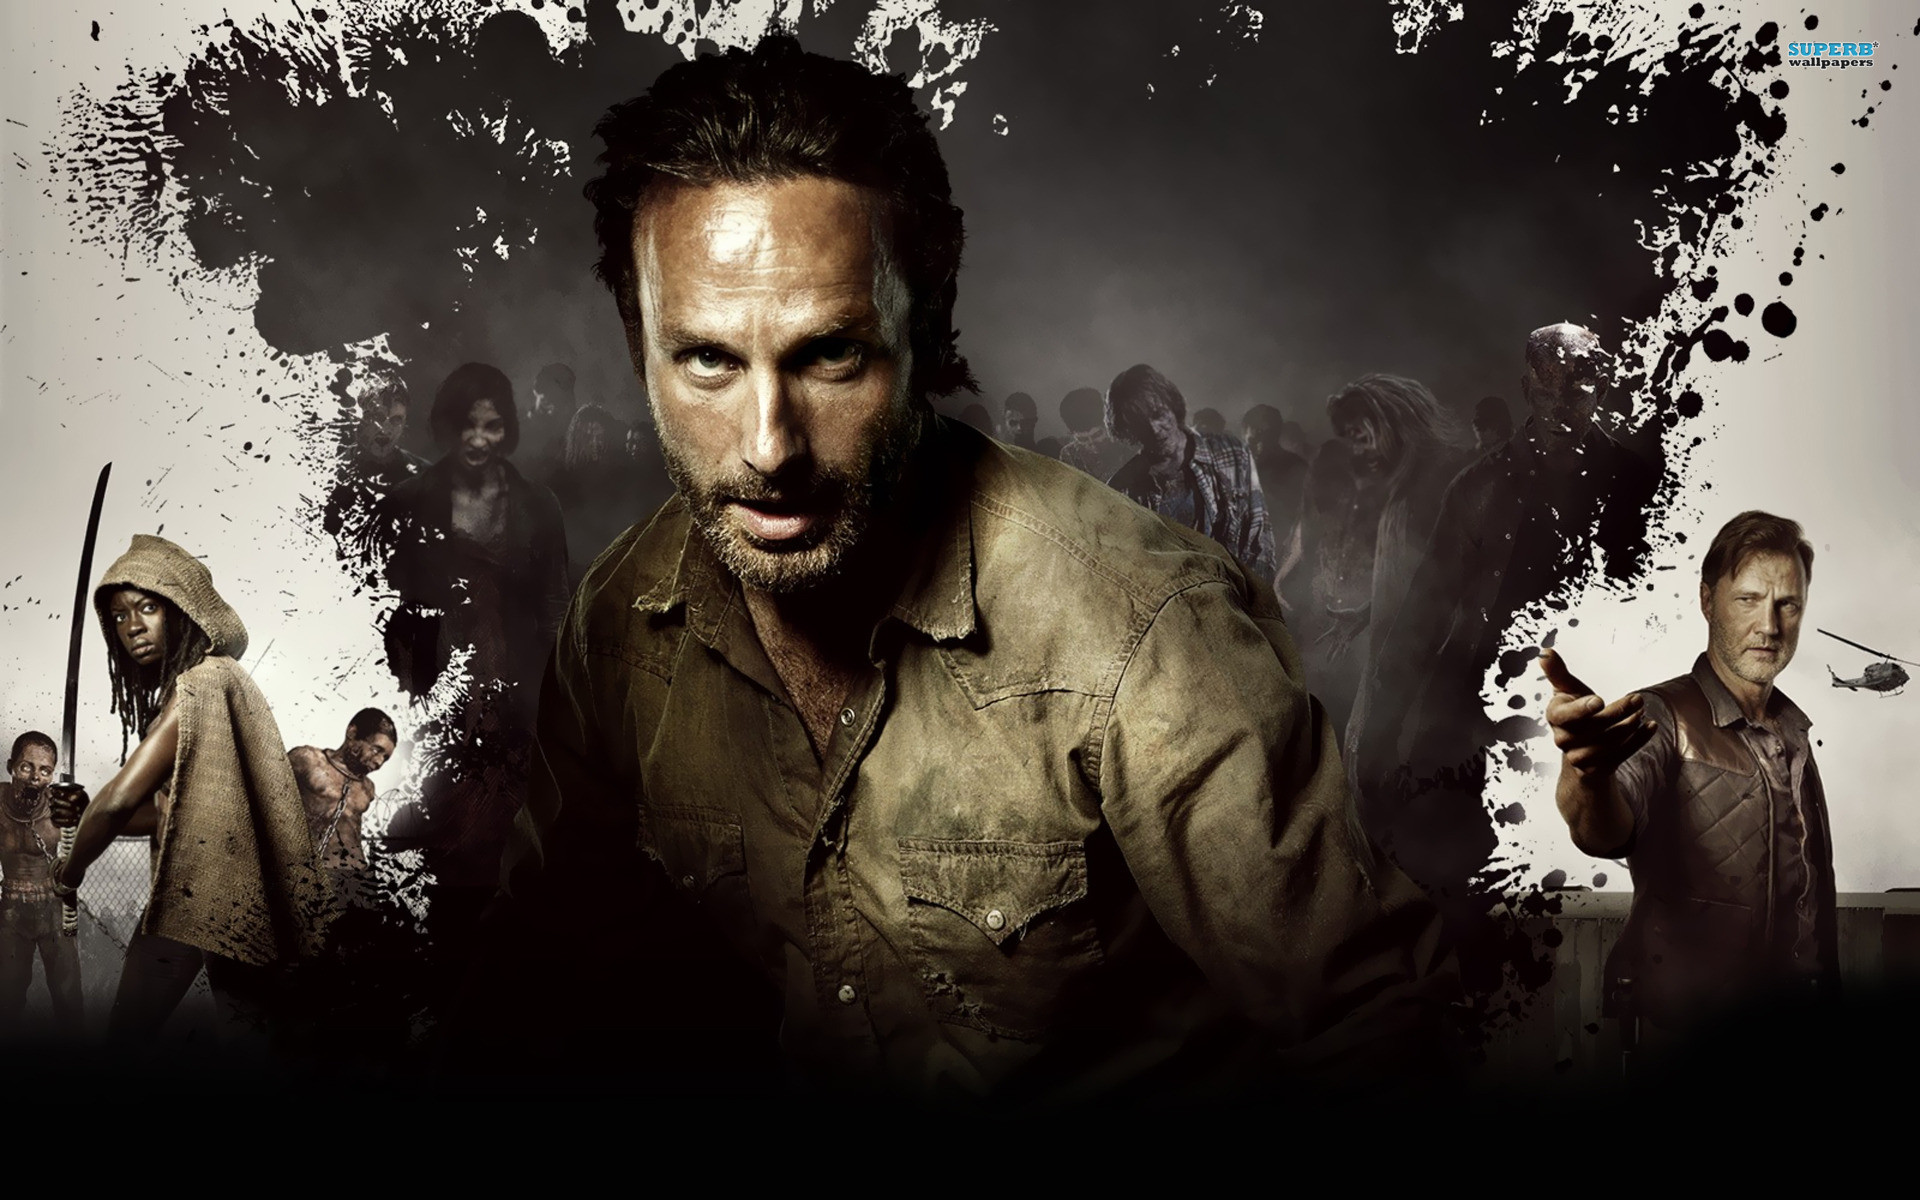 2013 The Walking Dead Season 4 Exclusive HD Wallpapers 5934 5GBF9qX0